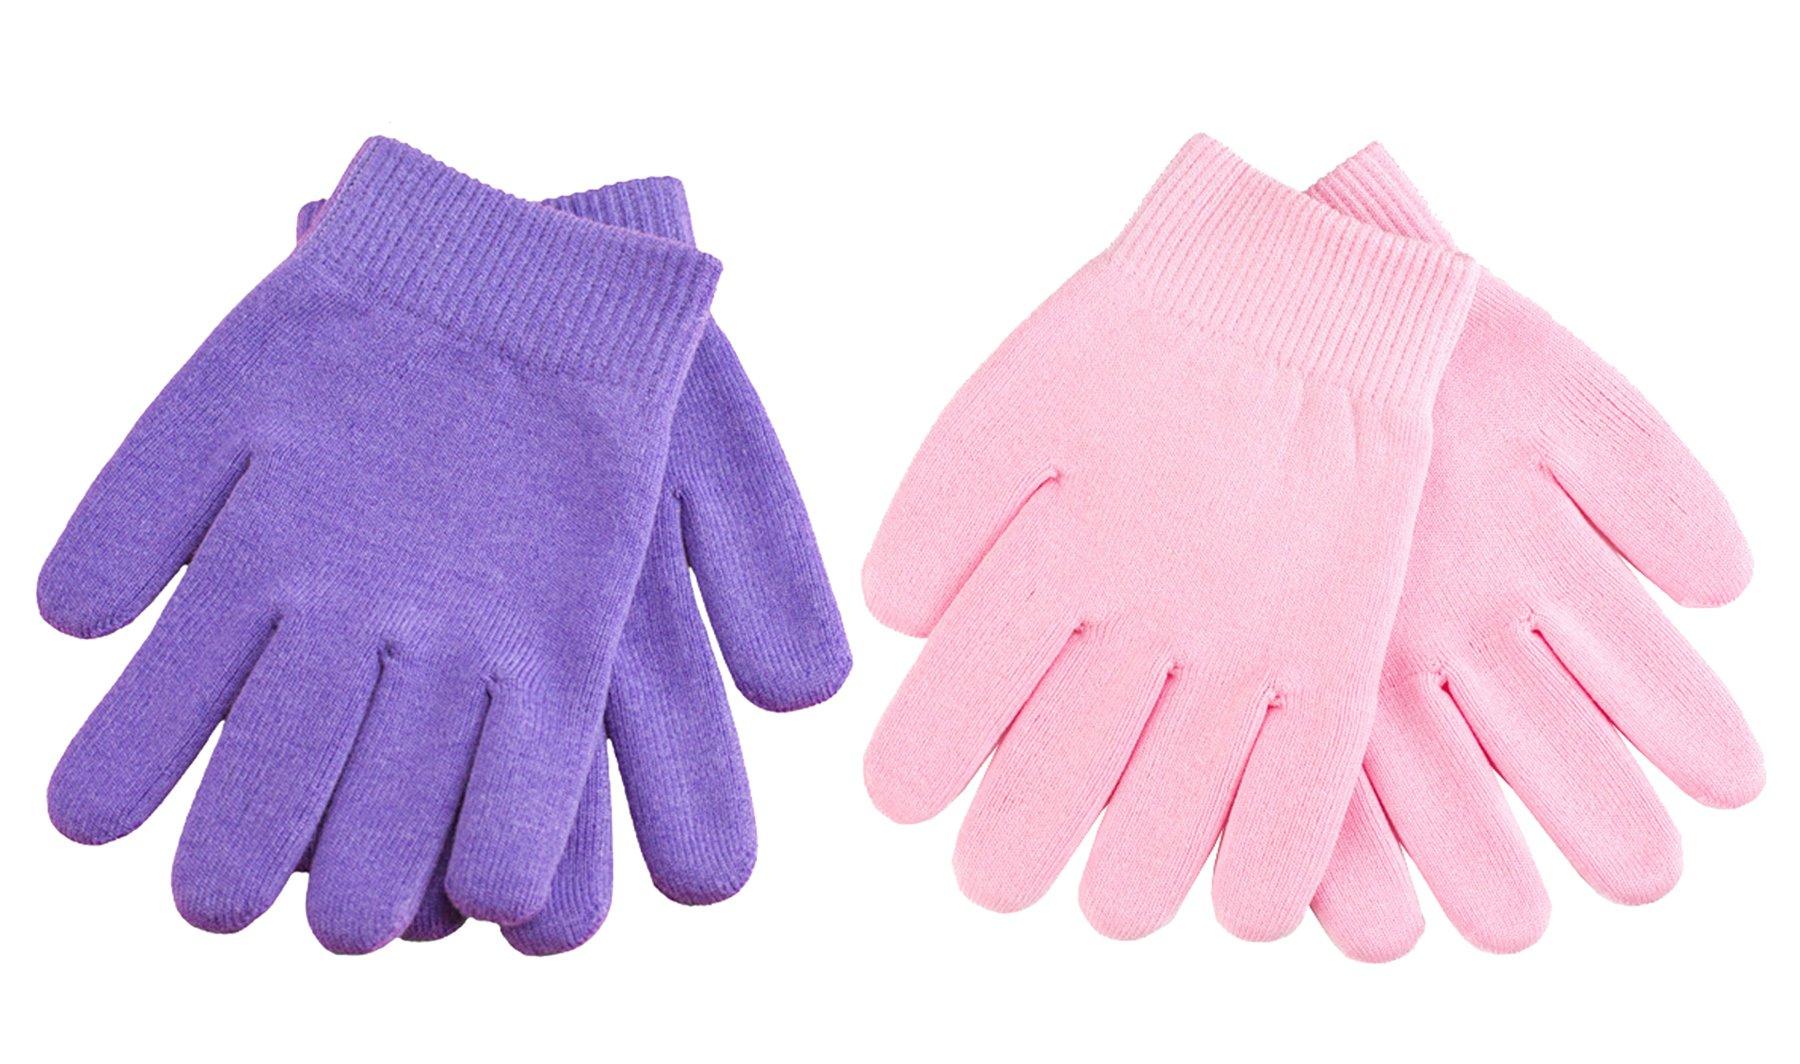 Moisturizing Gel Gloves Spa Gloves Cosmetic Moisturizing Gloves for Dry Hand (Pink-Purple)